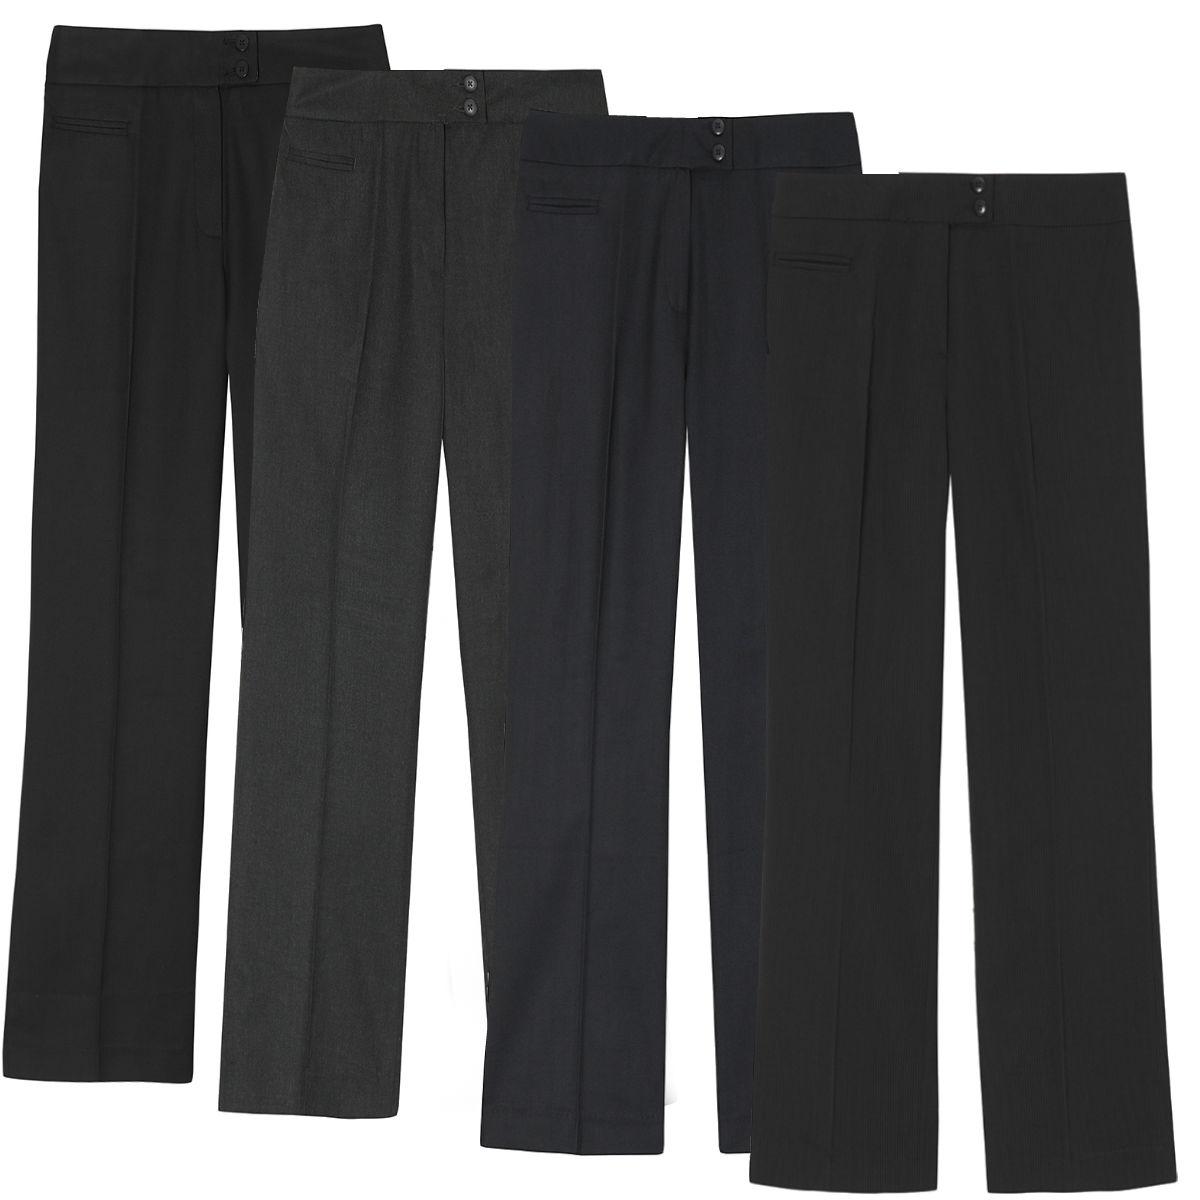 ladies straight leg work trousers sizes 8 14 pinstripe. Black Bedroom Furniture Sets. Home Design Ideas